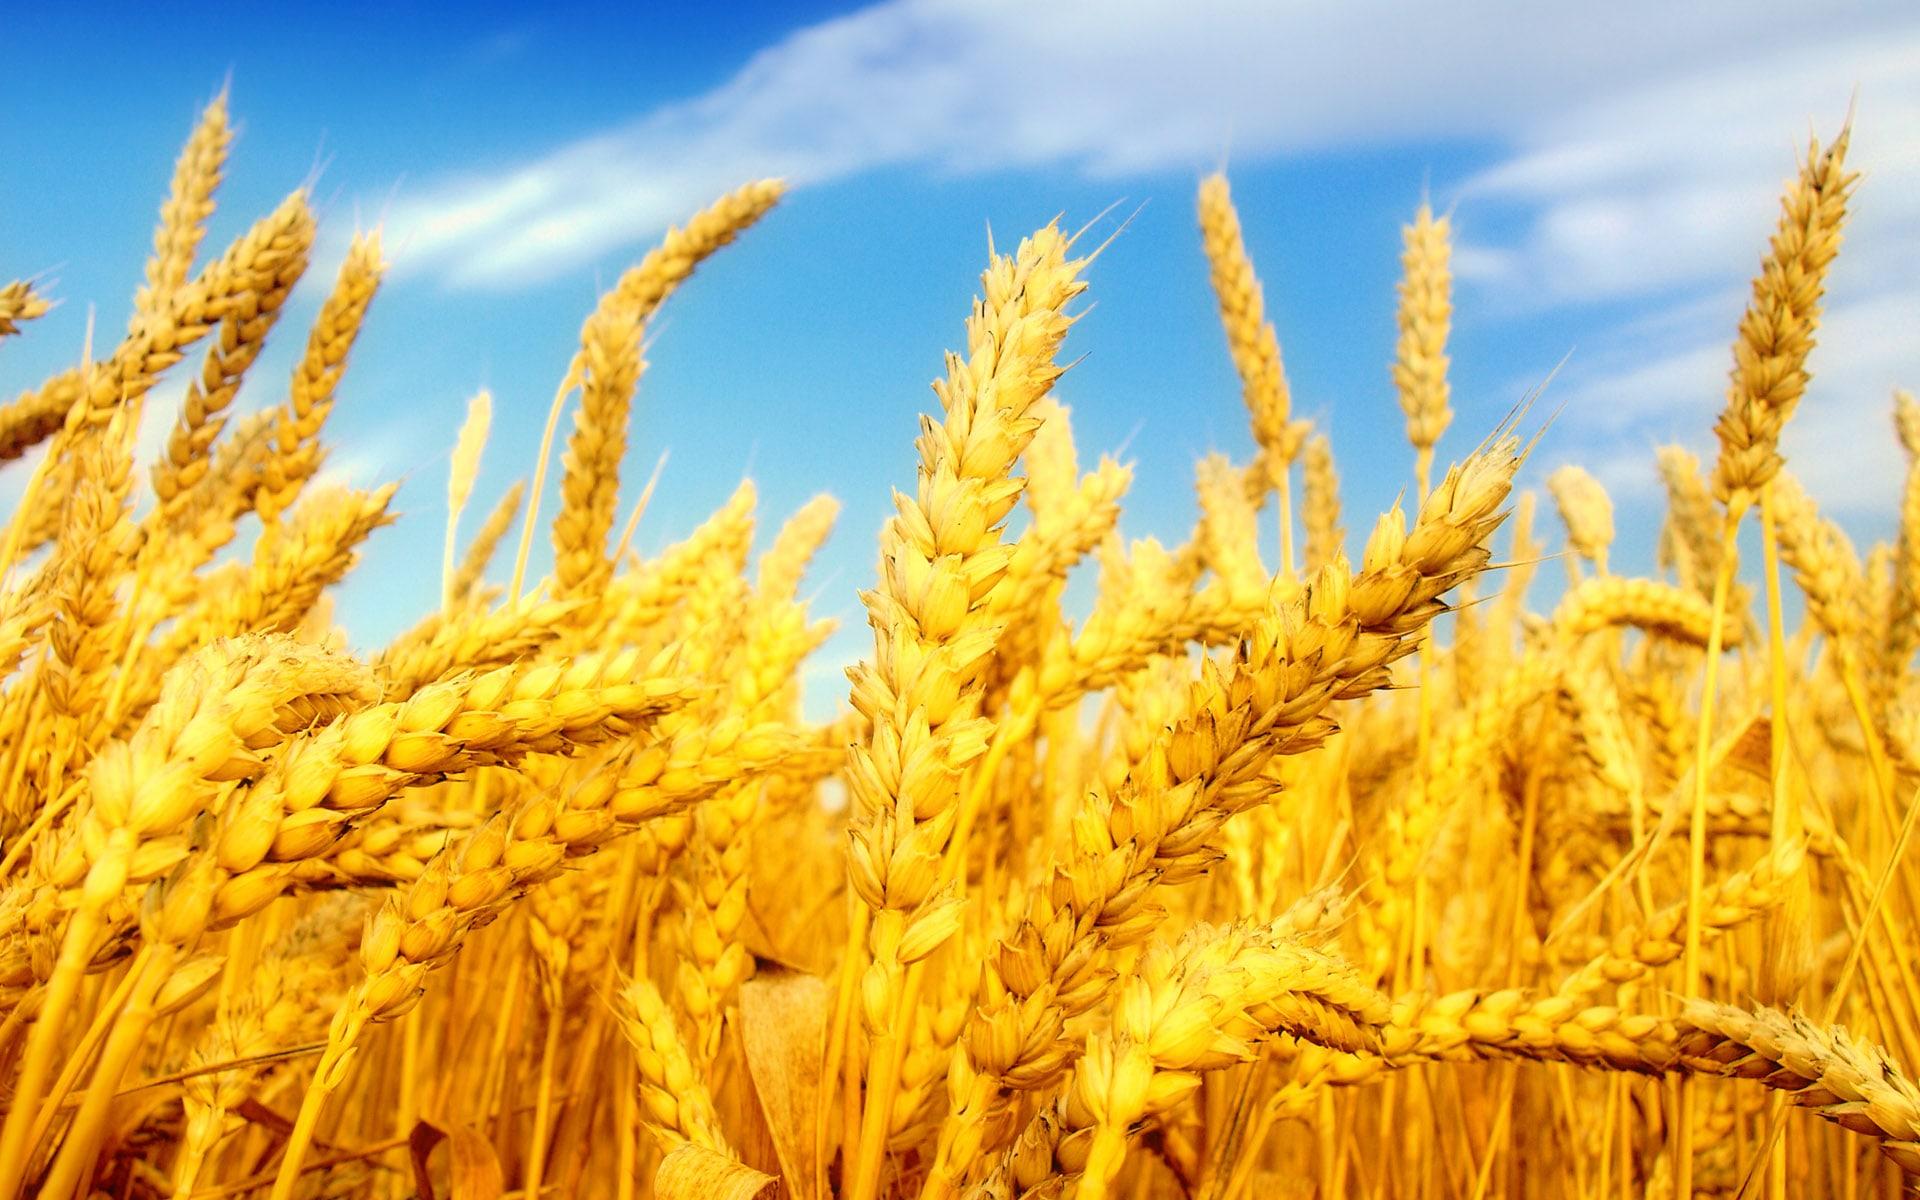 İyi olgunlaşmış buğday başakları.